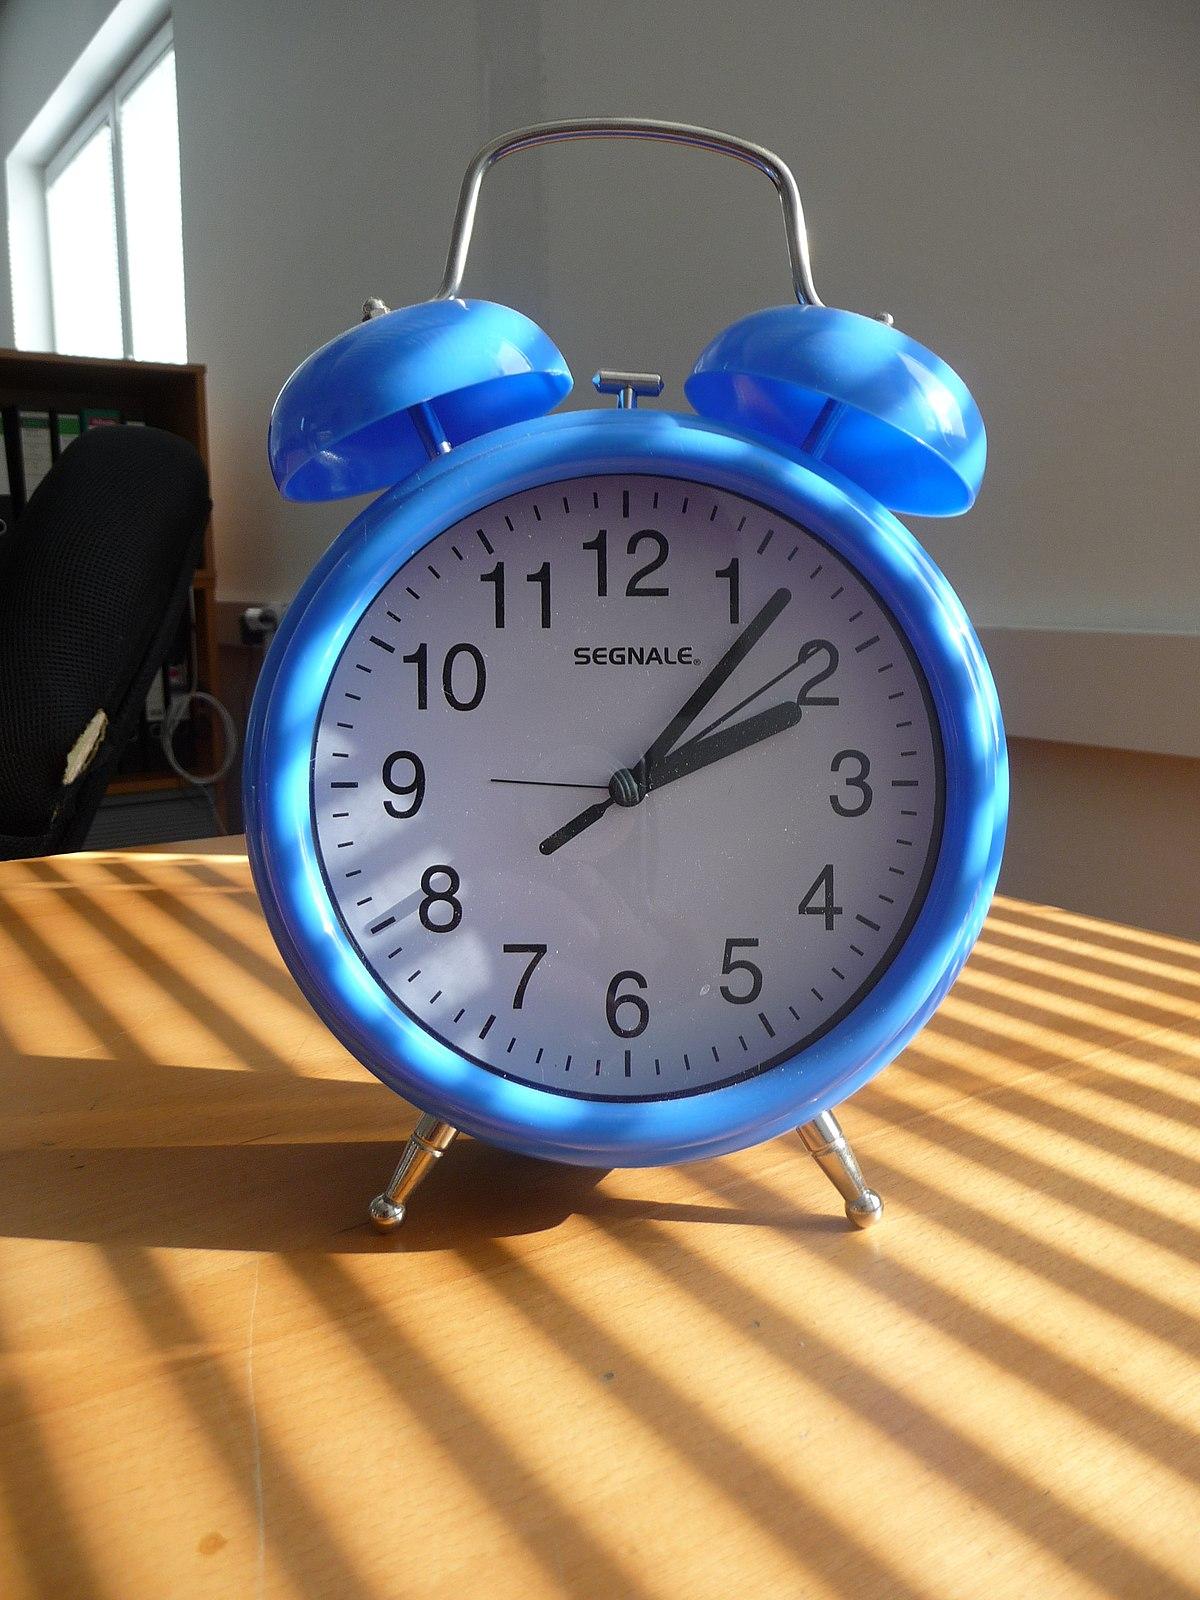 File:Blue alarm clock (3).jpg - Wikimedia Commons